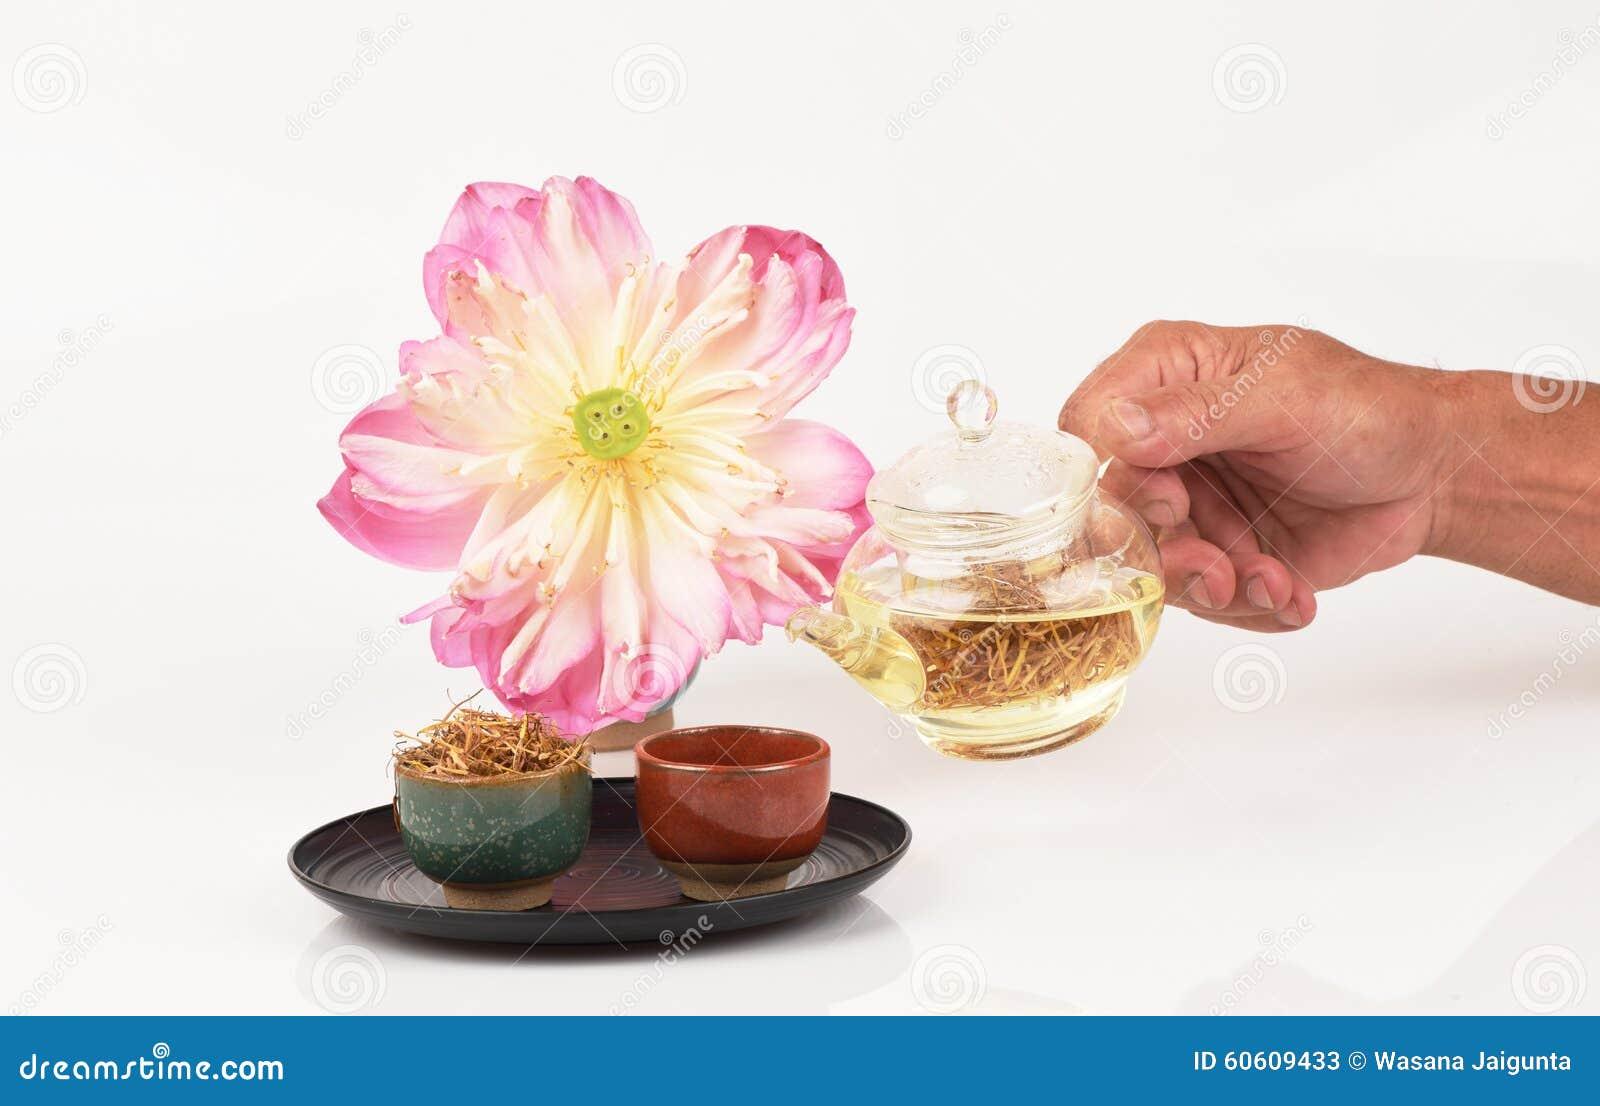 Lotus Stamen Tea Stock Photo Image 60609433